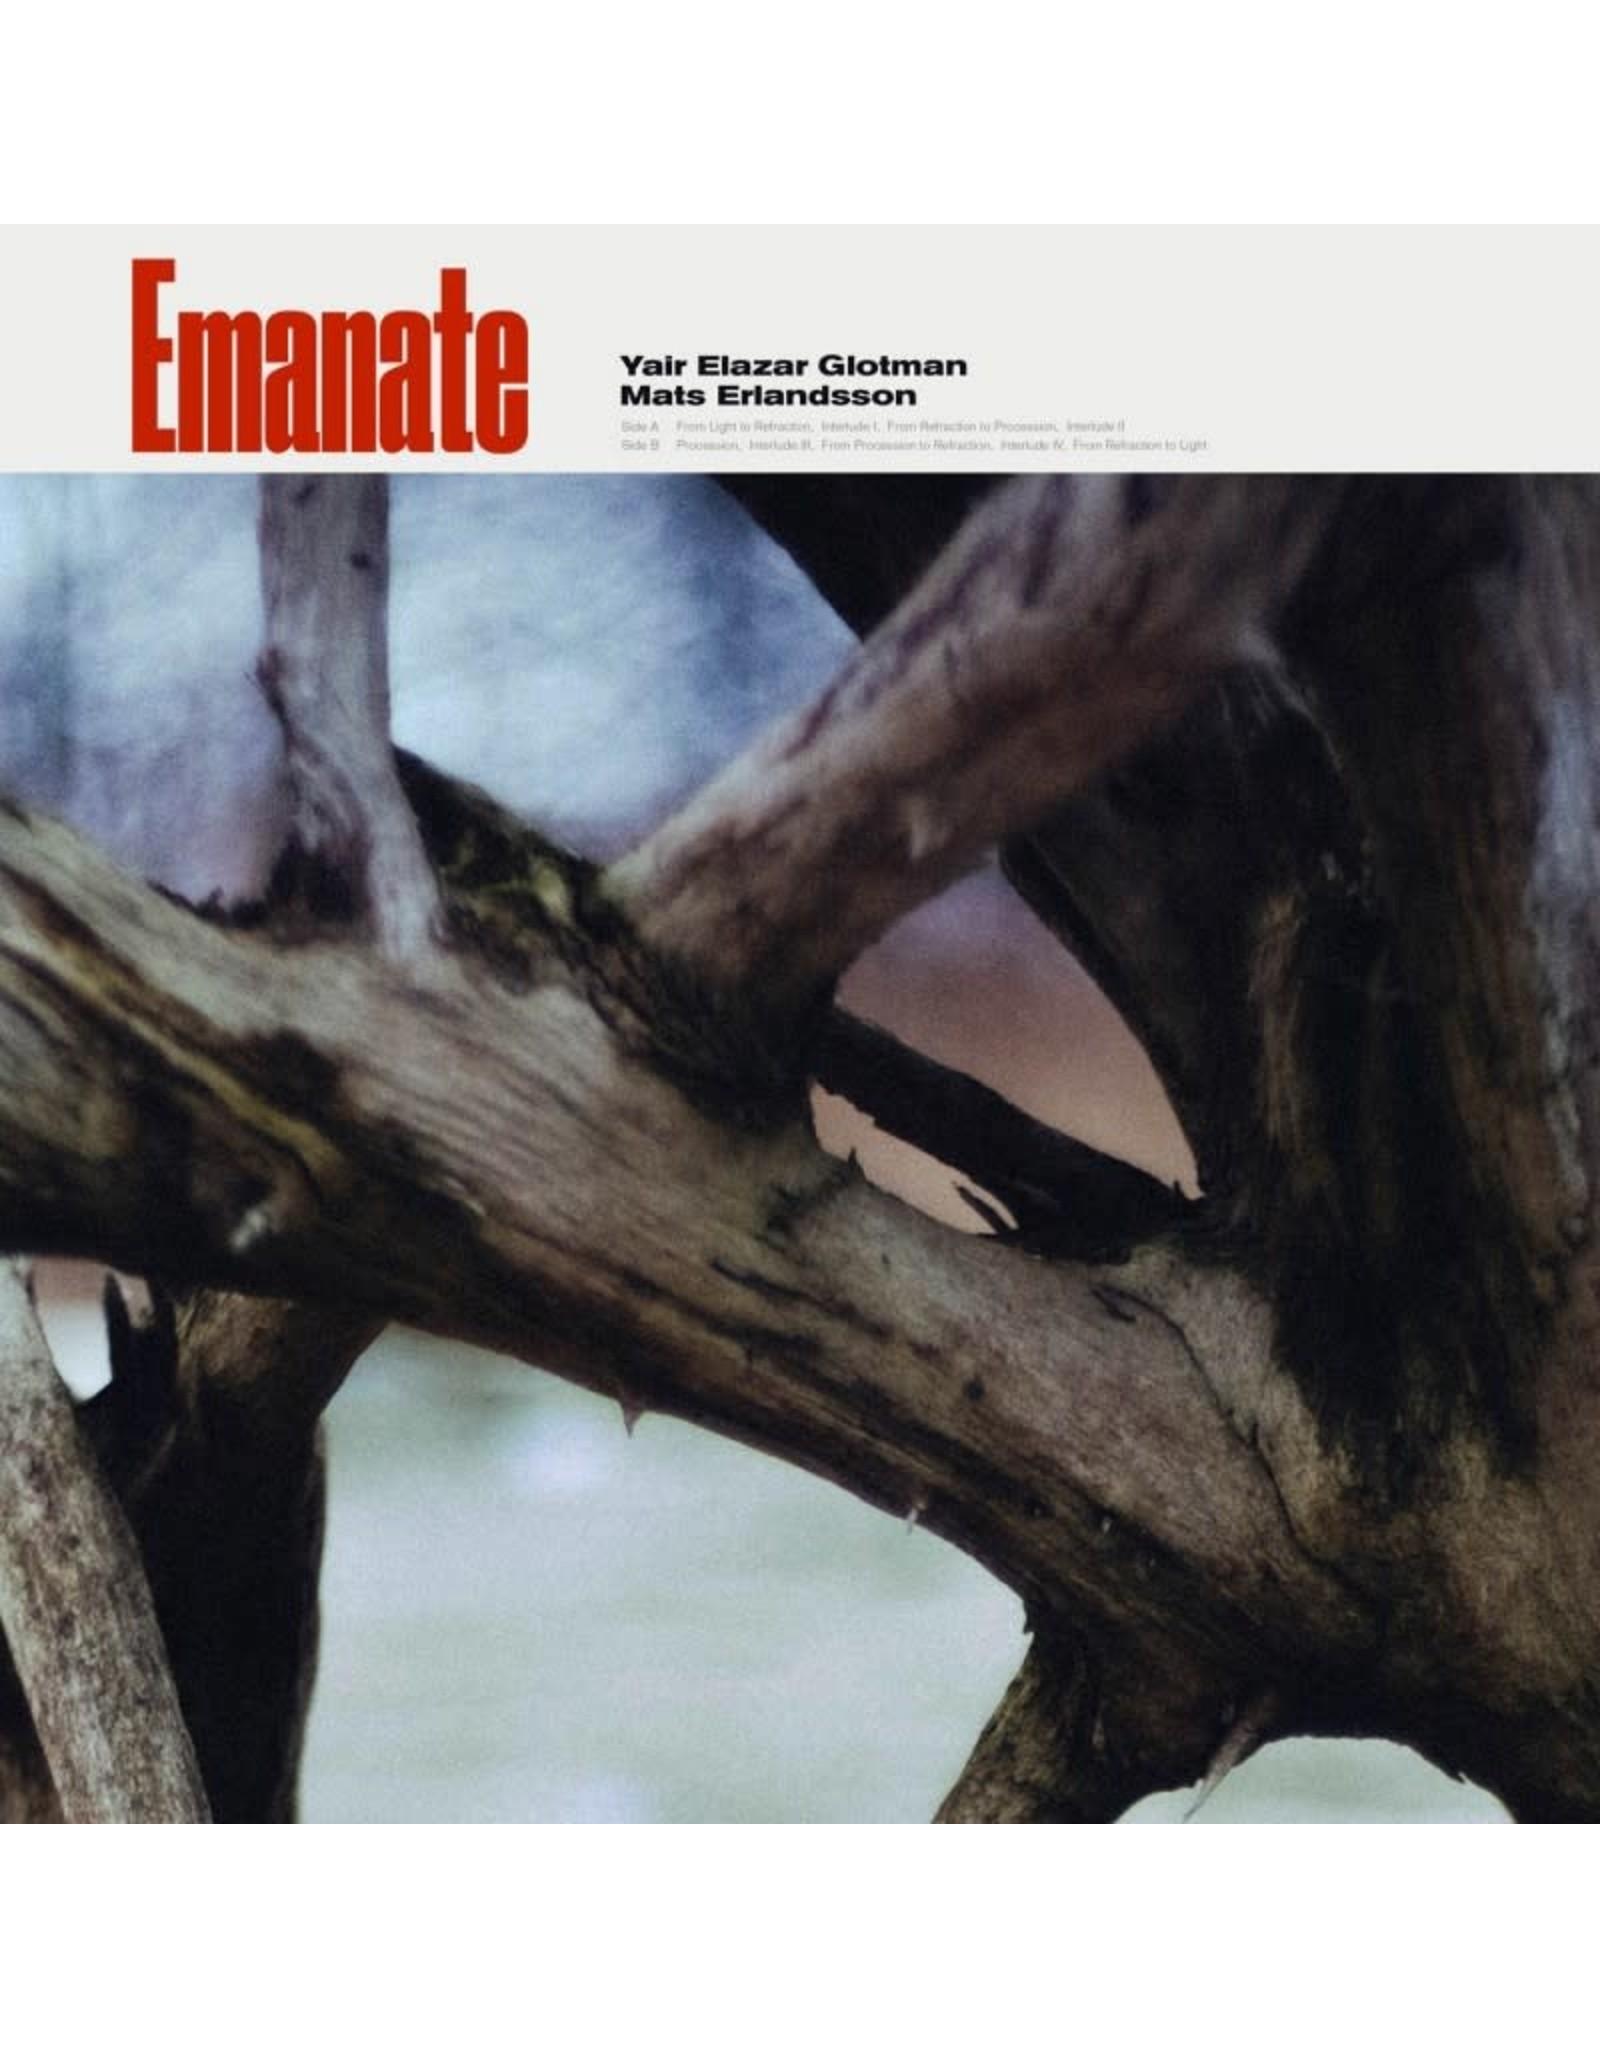 130701 Glotman, Yair Elazar & Mats Erlandsson: Emanate LP